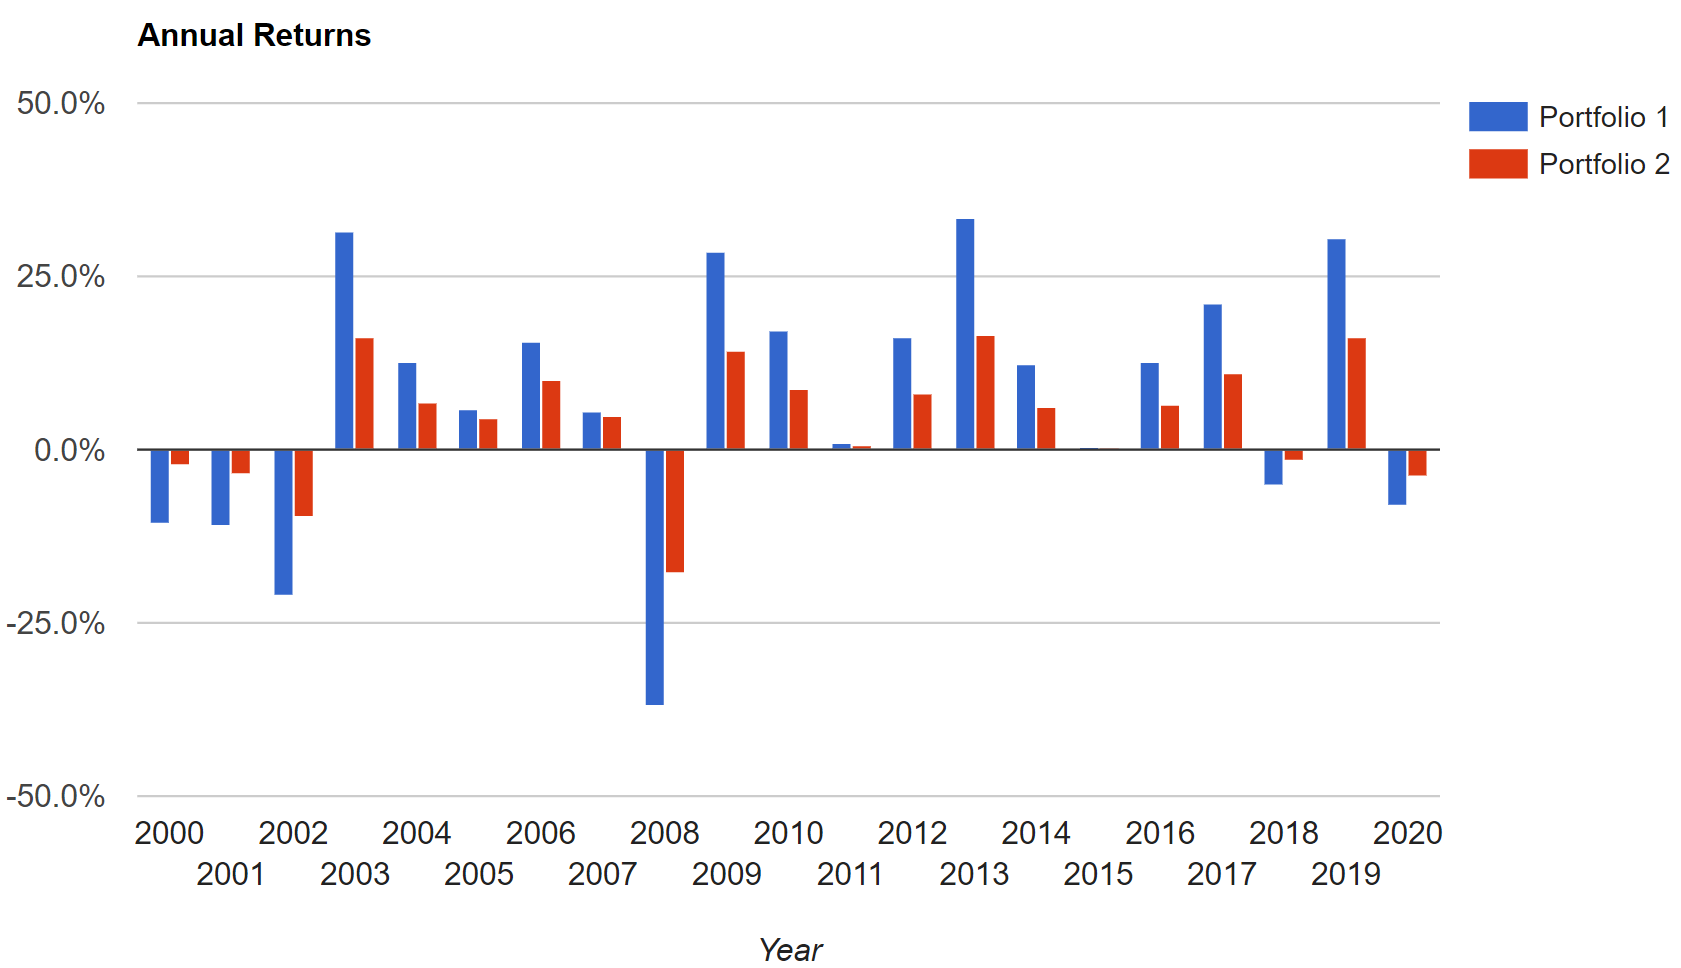 Annual returns for cash portfolios